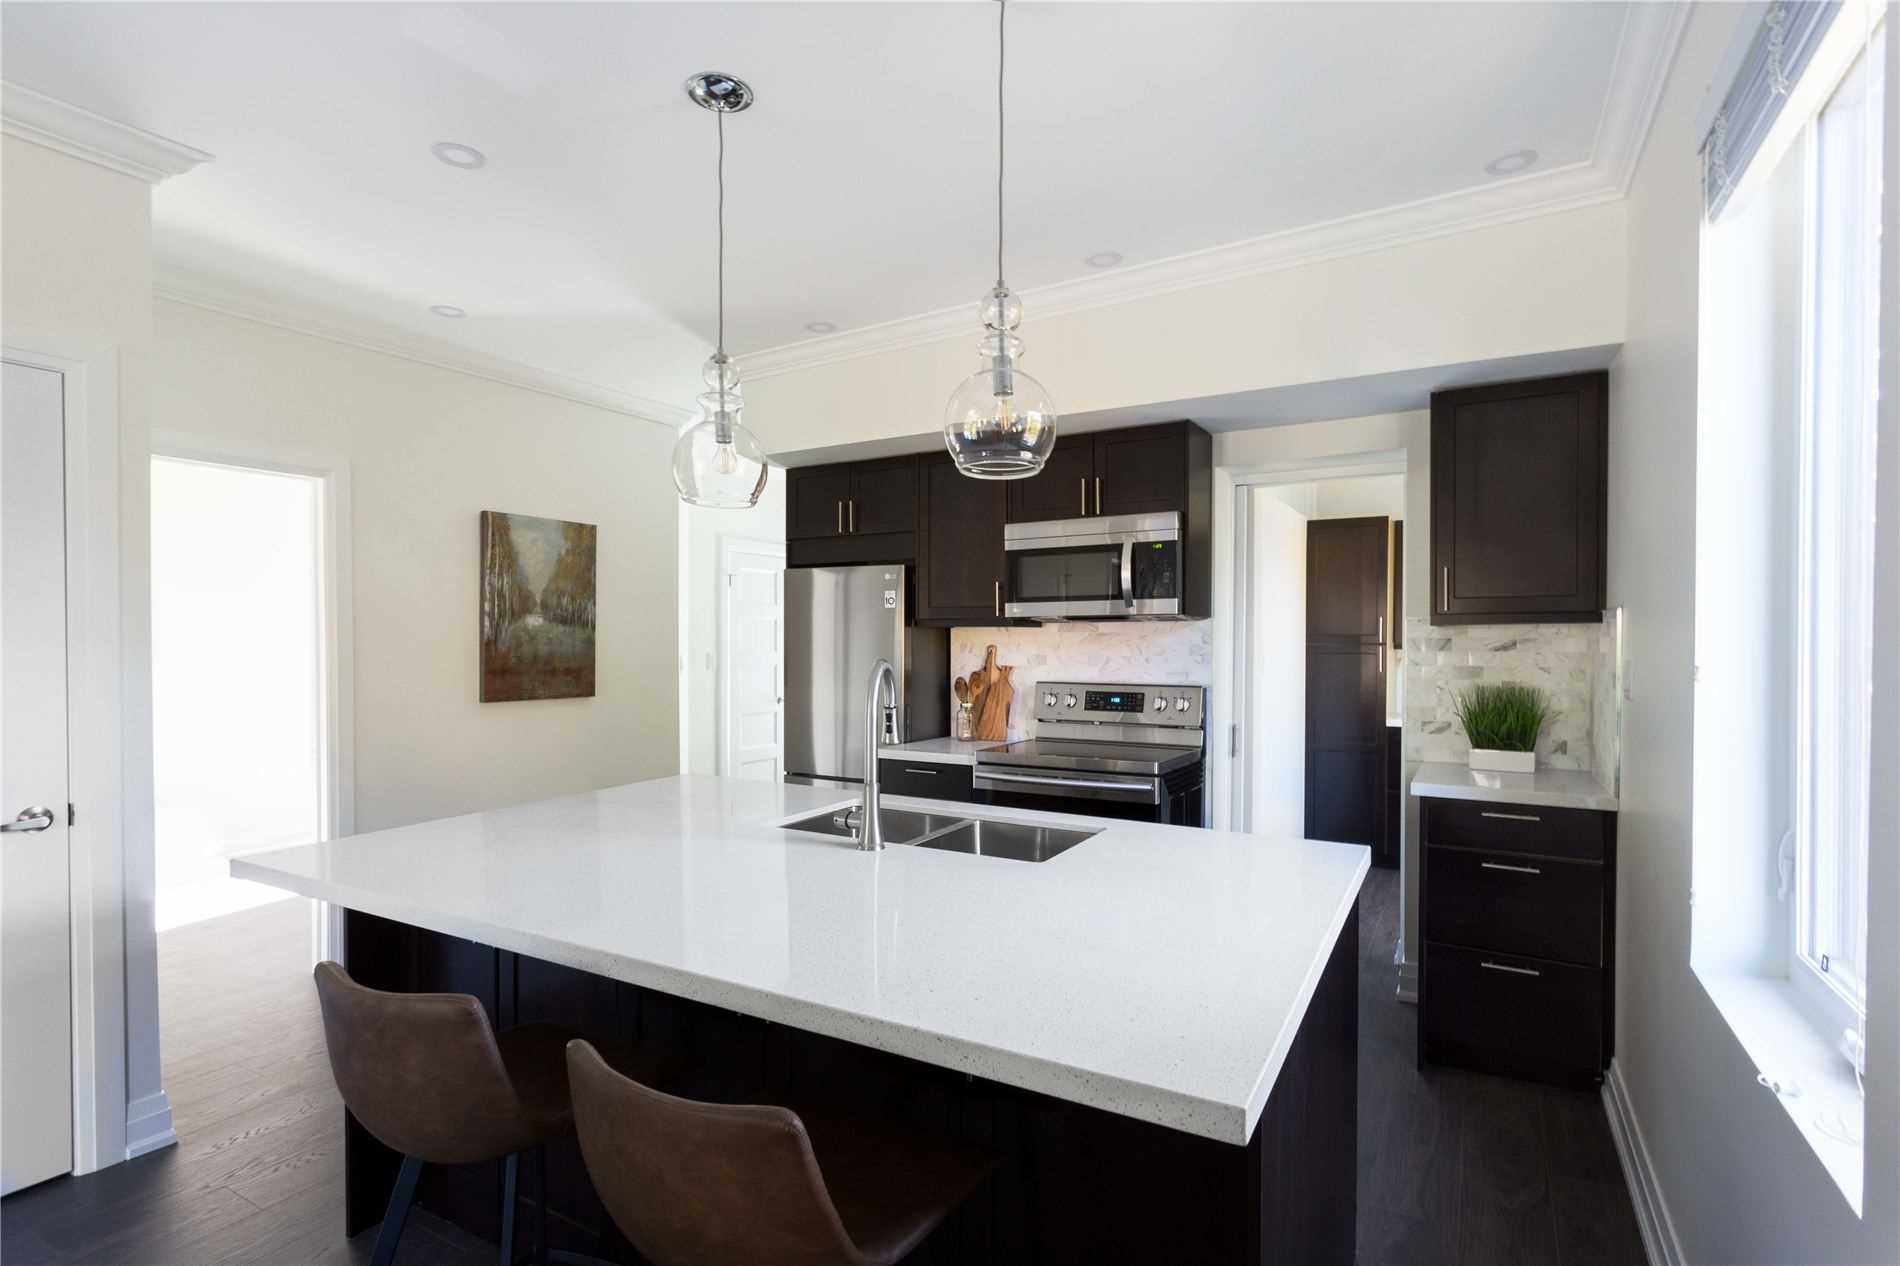 63 Jerome St, Toronto, Ontario M6P1H8, 9 Bedrooms Bedrooms, 27 Rooms Rooms,7 BathroomsBathrooms,Multiplex,For Sale,Jerome,W5255287